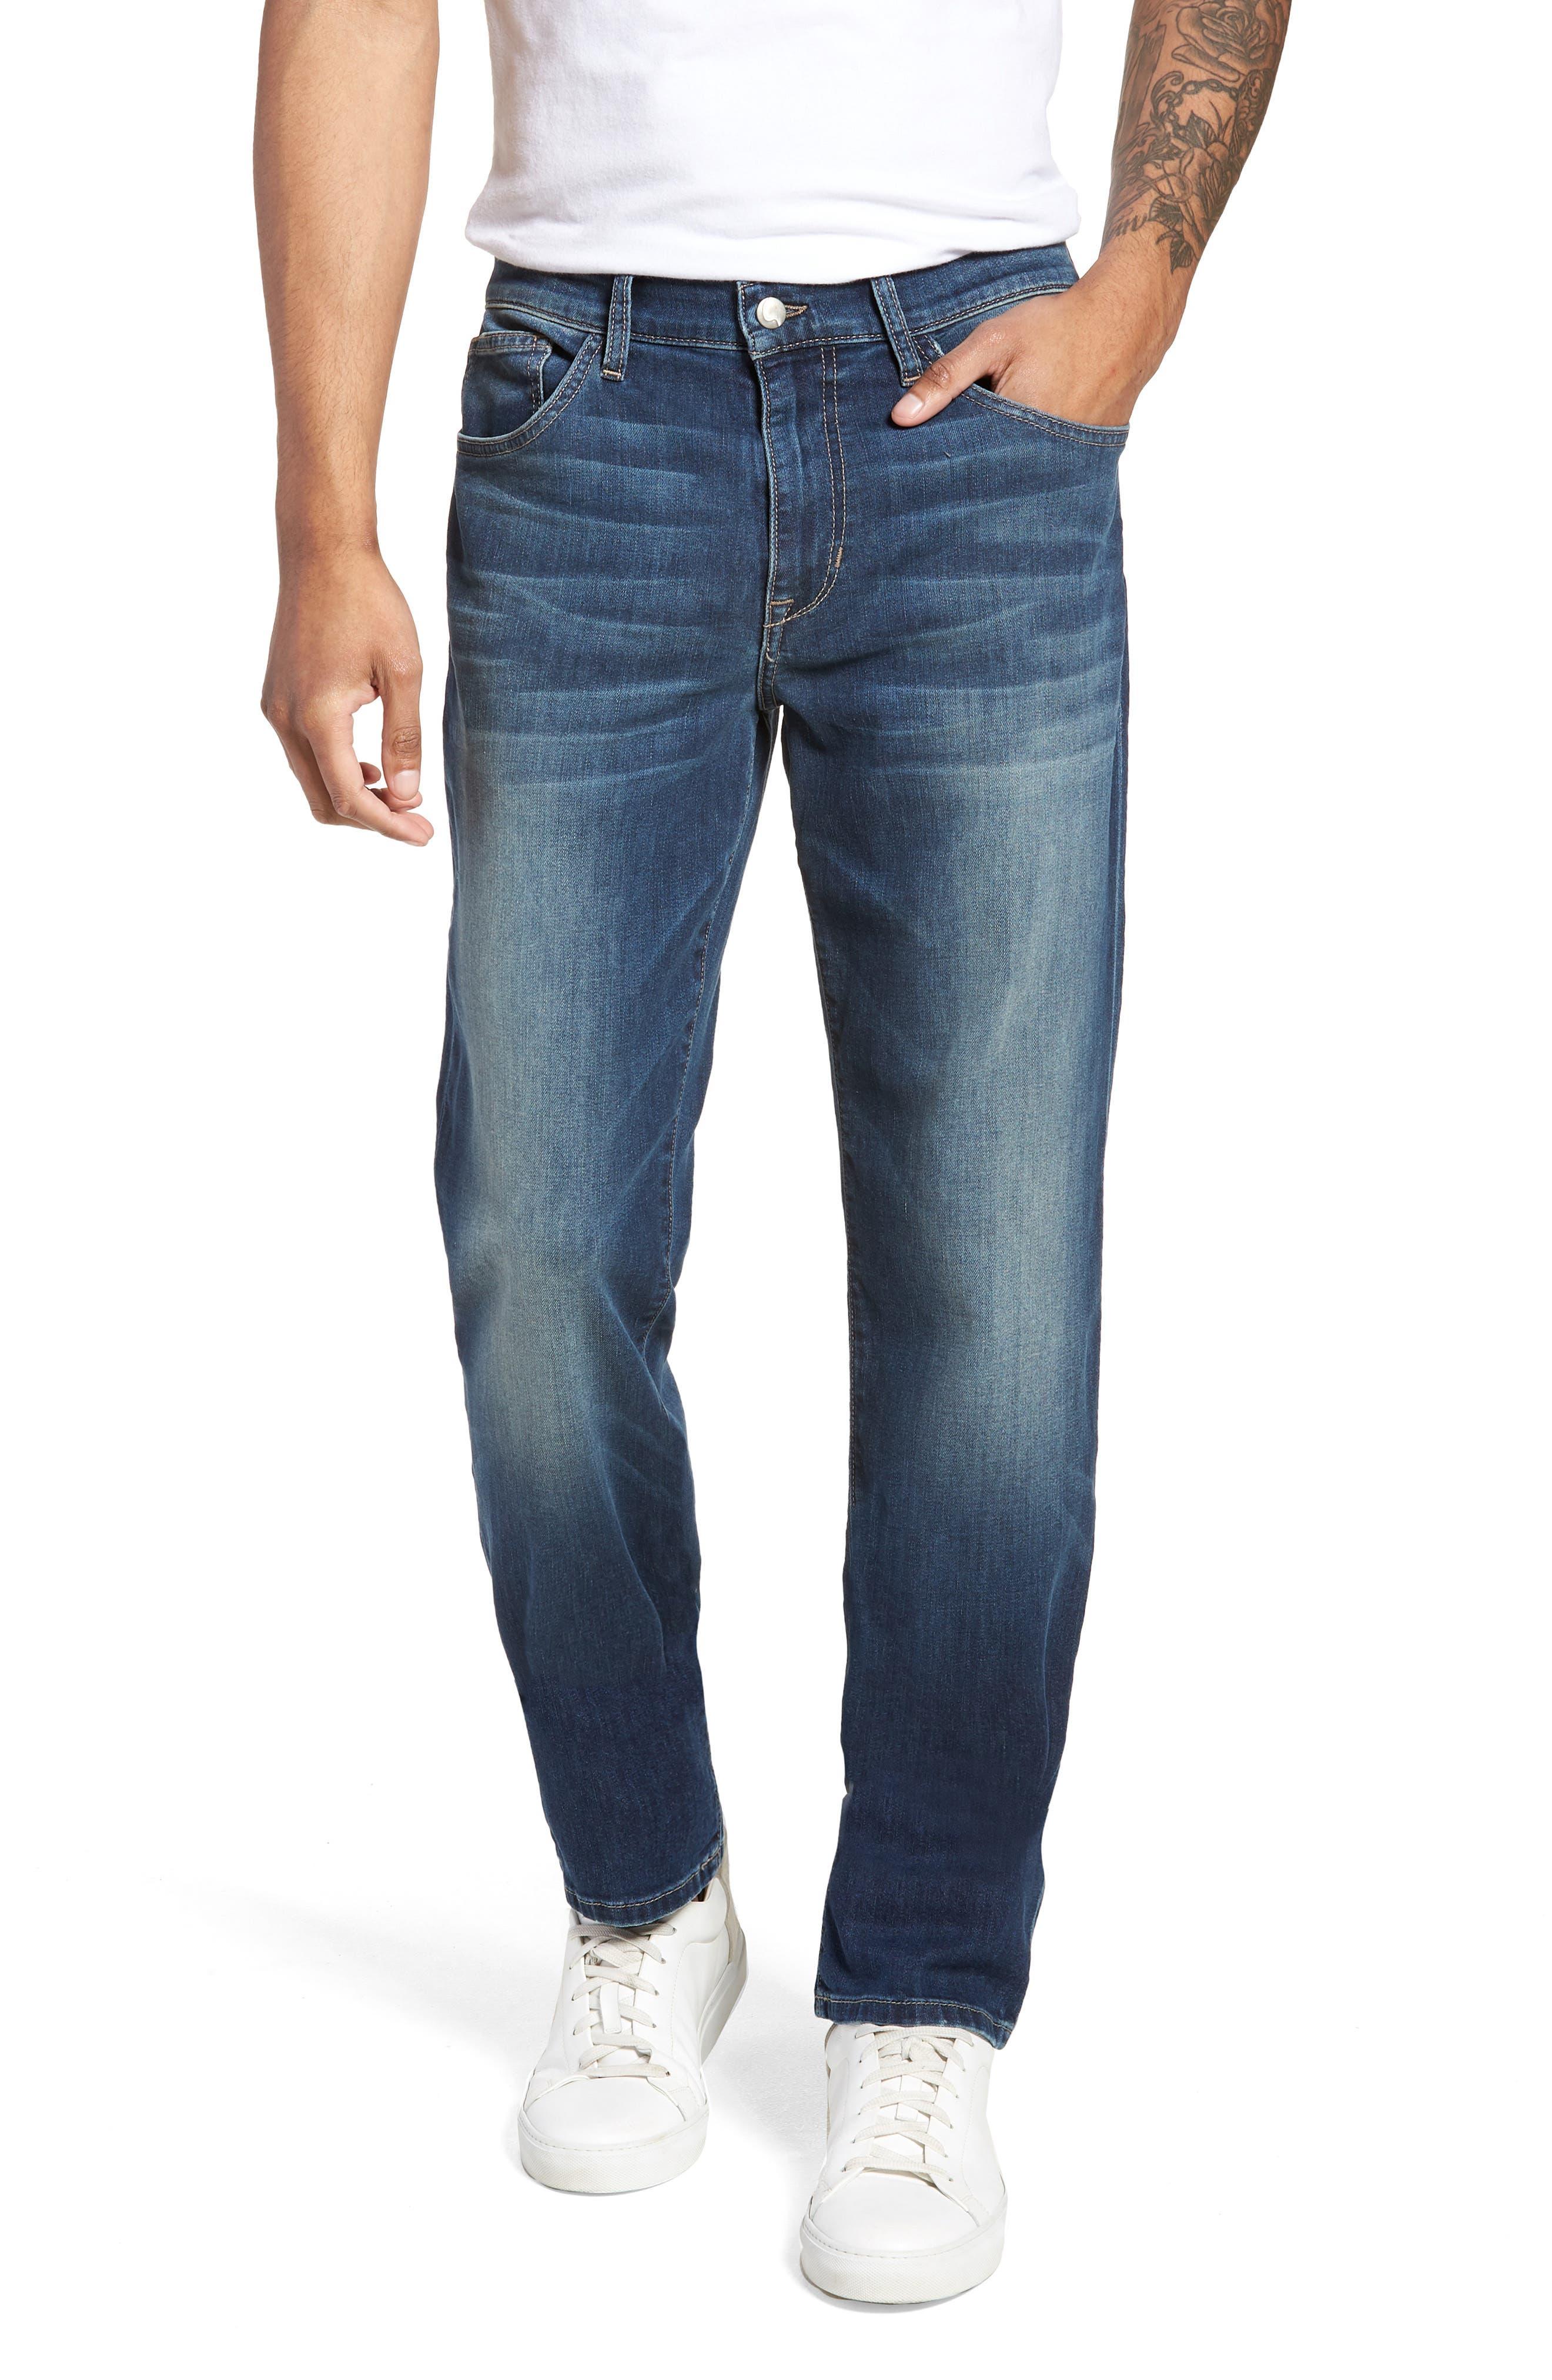 Brixton Slim Straight Fit Jeans,                         Main,                         color, 400